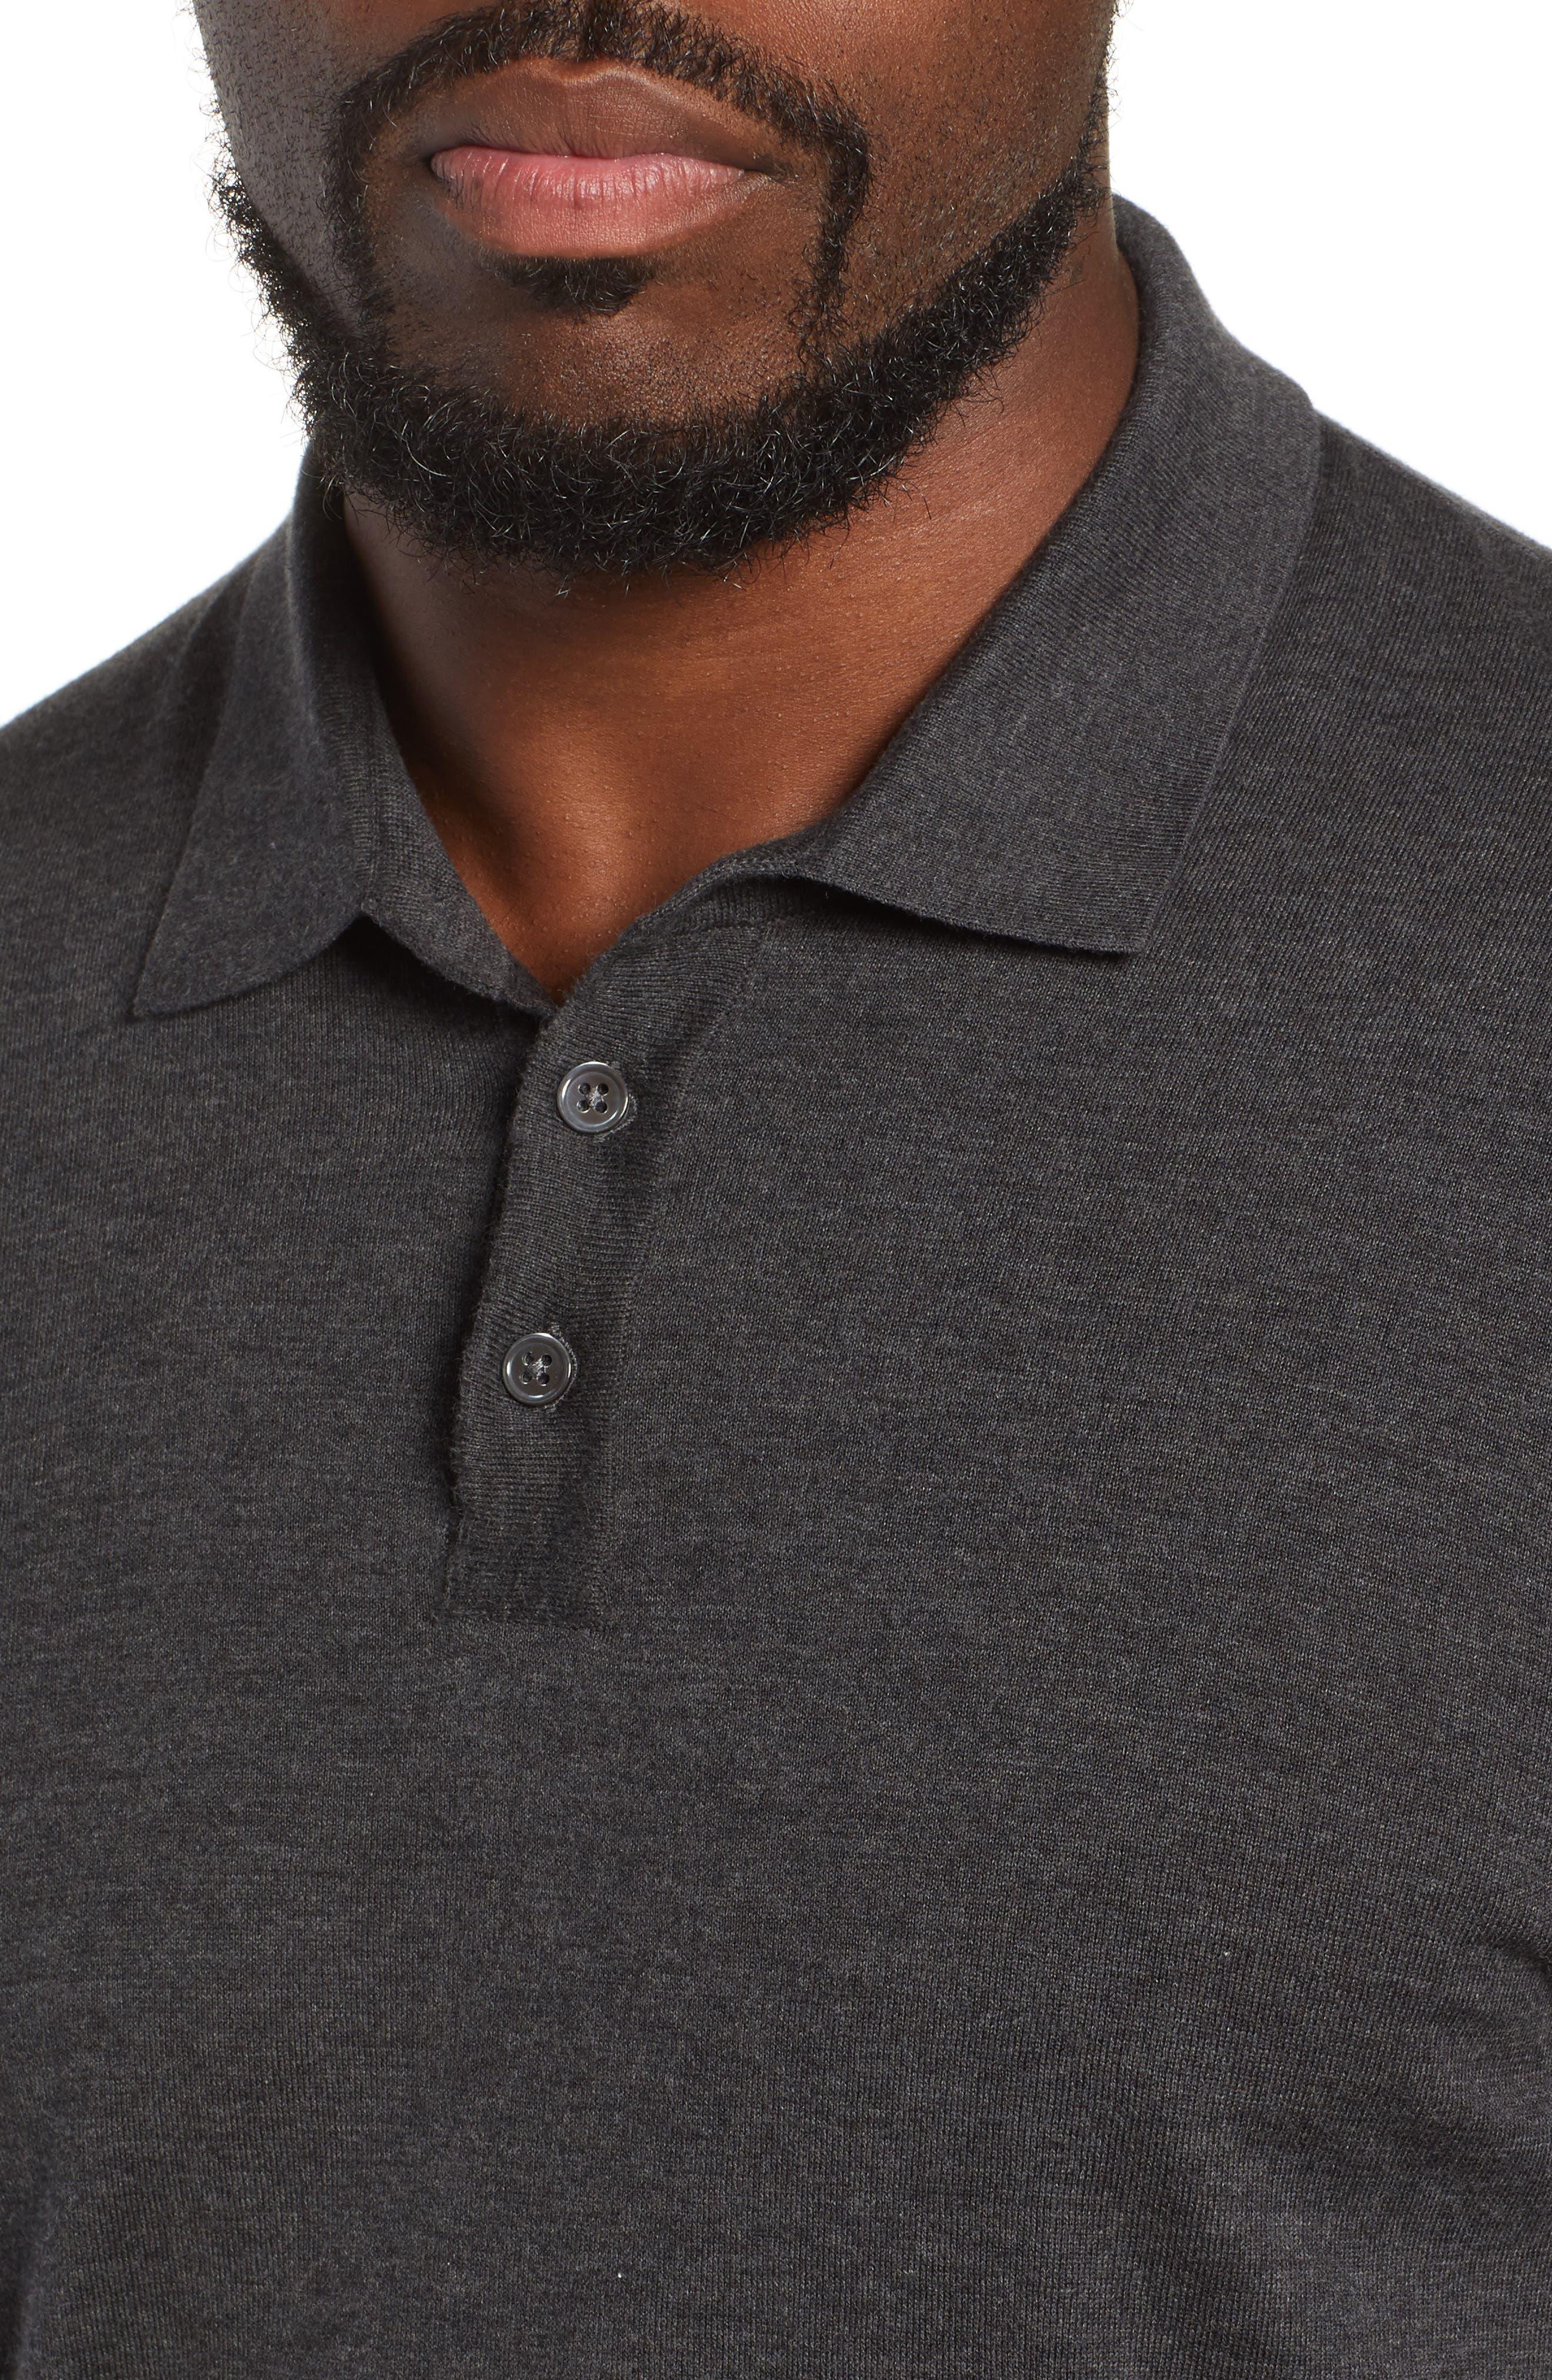 Fine Gauge Regular Fit Cotton Polo,                             Alternate thumbnail 4, color,                             HEATHER CHARCOAL